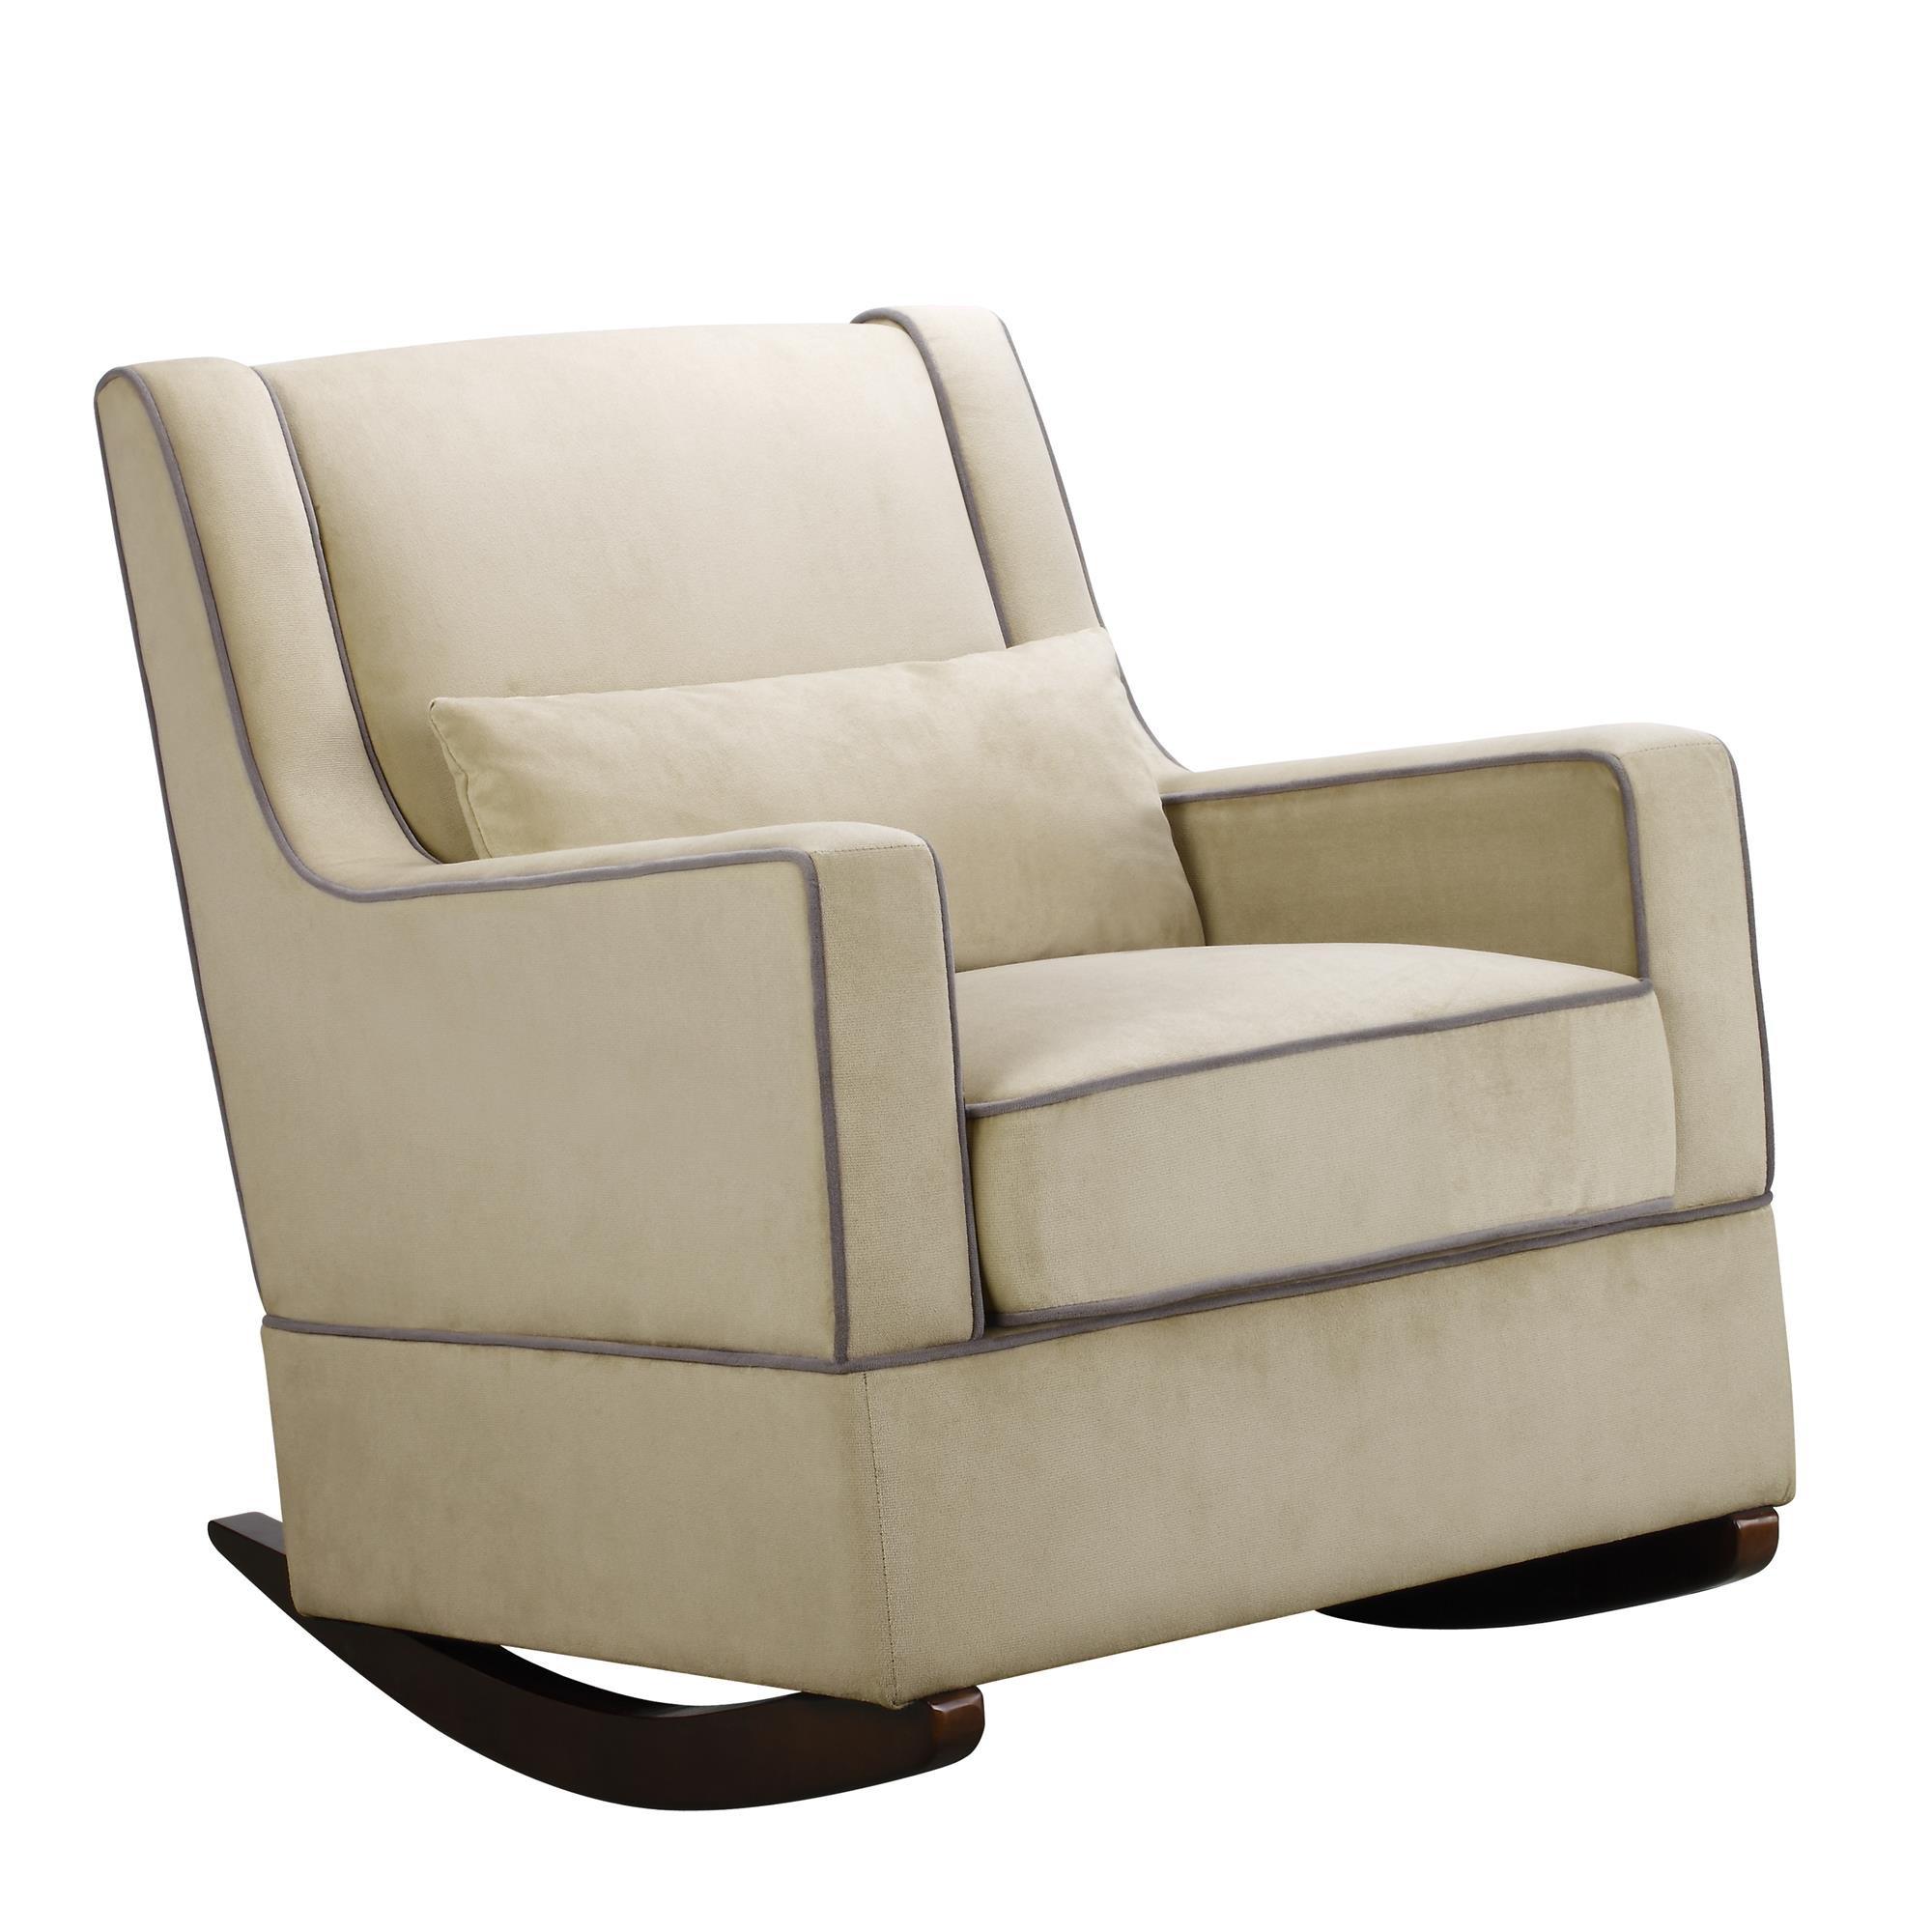 Baby Relax The Sydney Nursery Microfiber Rocker Chair and Free Lumbar Pillow, Beige